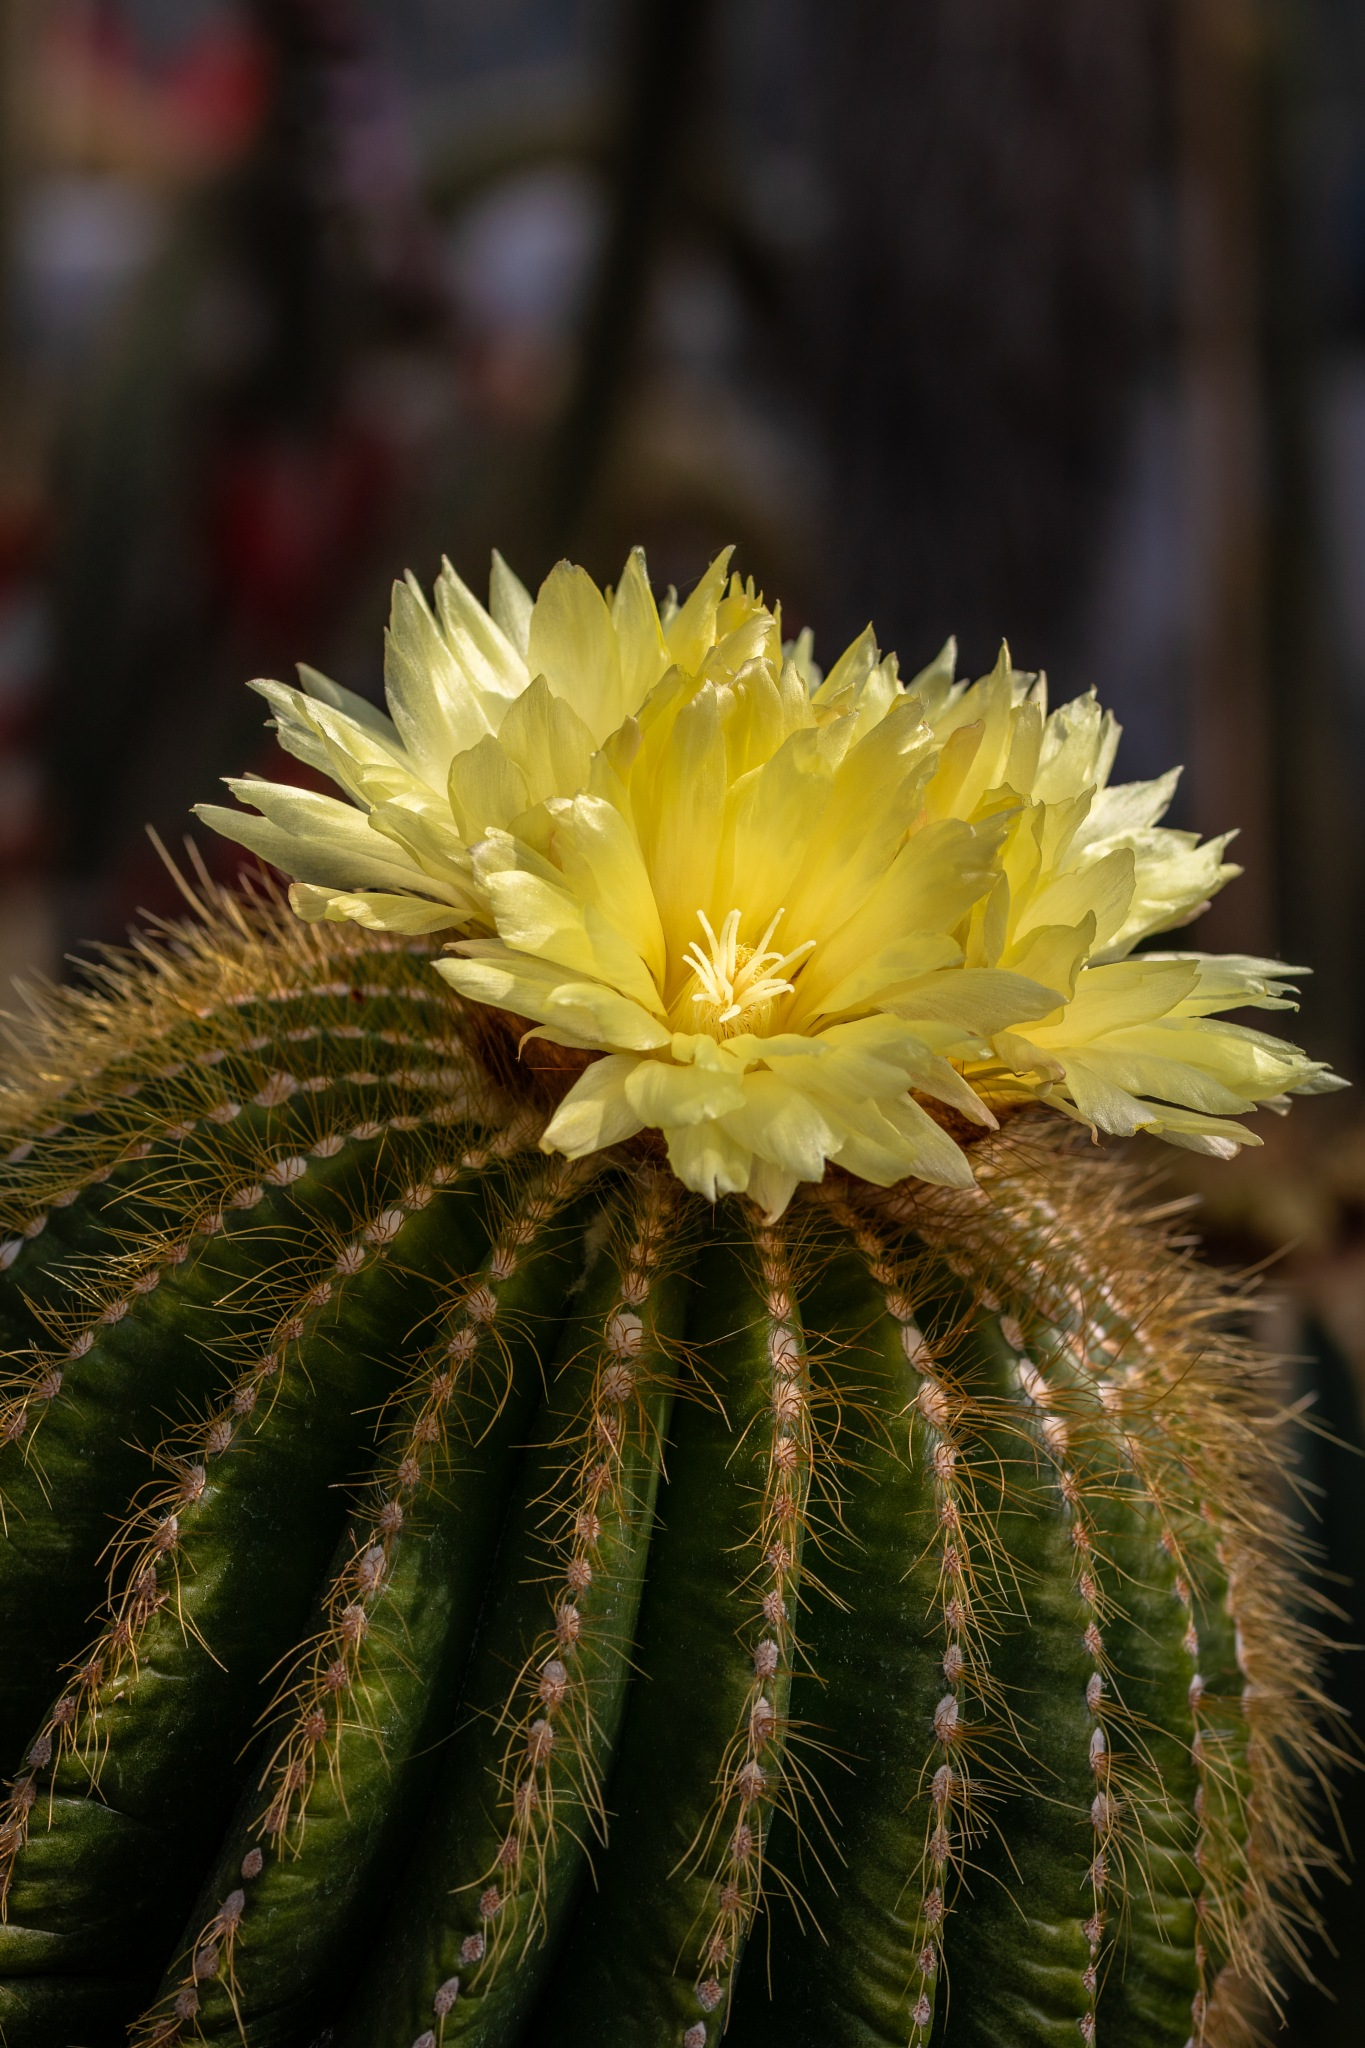 Kaktusblüte#2 by Sven Kuhn